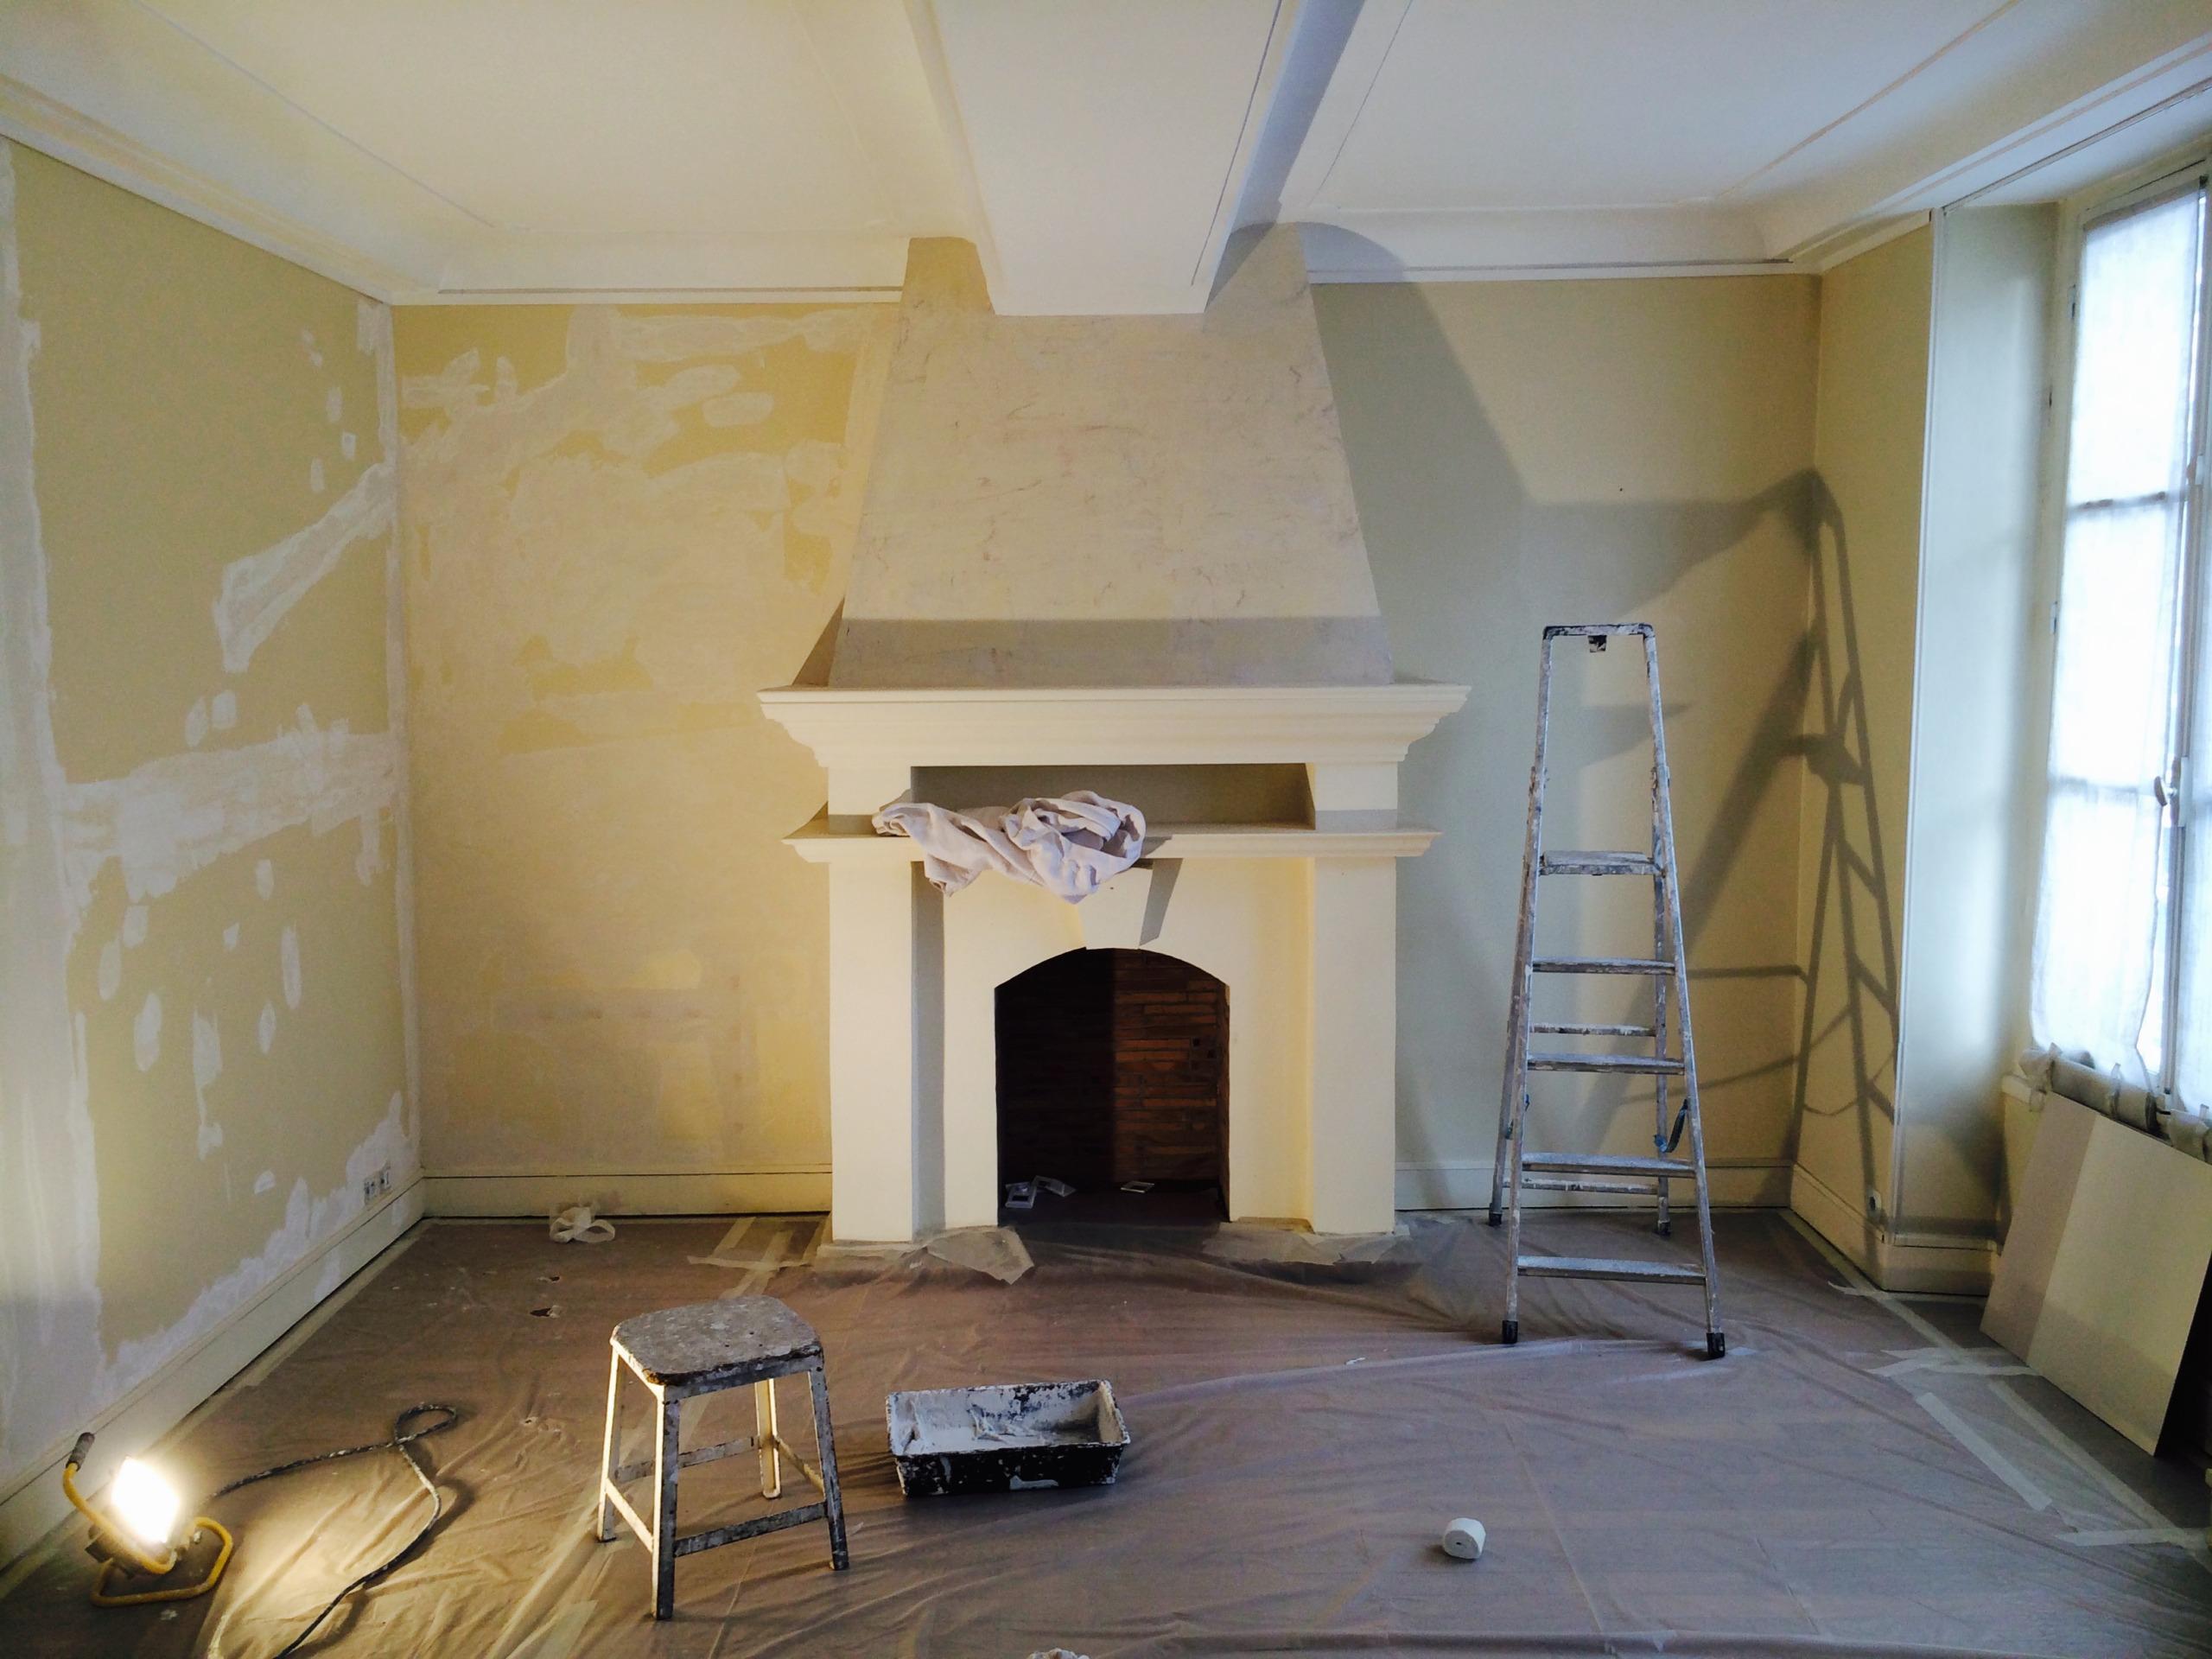 rattraper defaut peinture plafond orleans